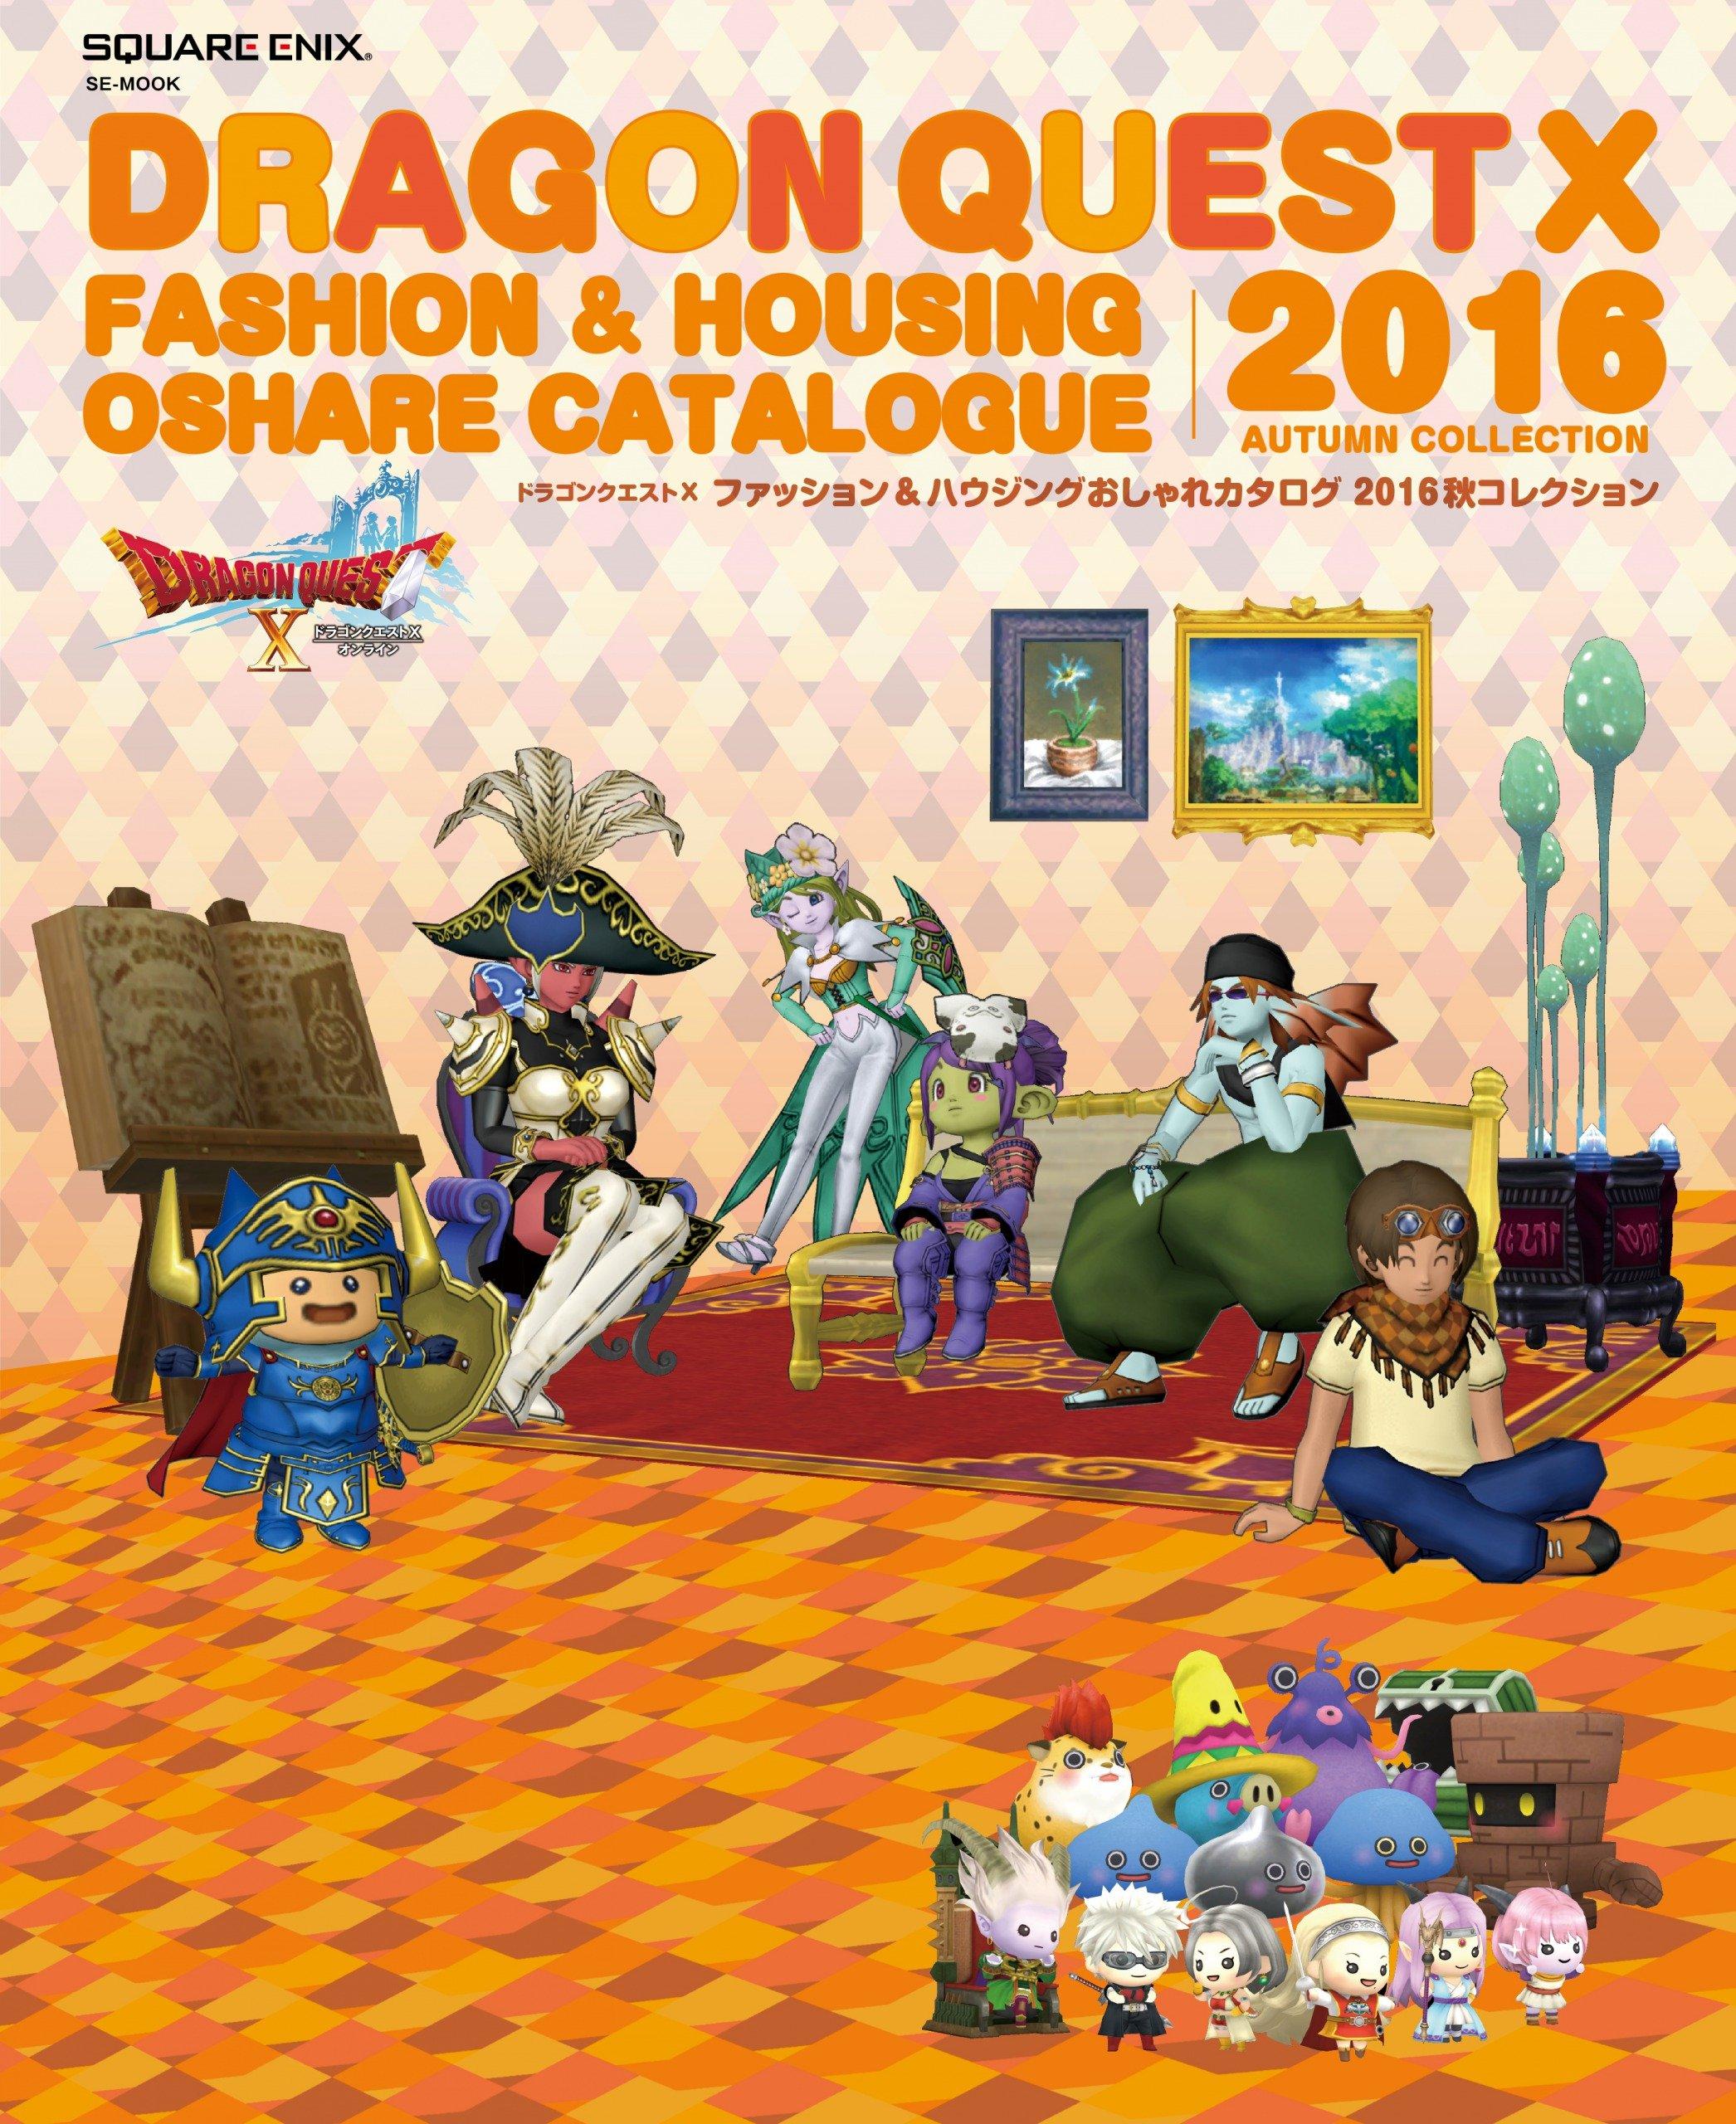 http://blog.jp.square-enix.com/magazine/dqx_guide/7a9c262514a75cb327f5bfecf019f79a3a2001ed.jpg